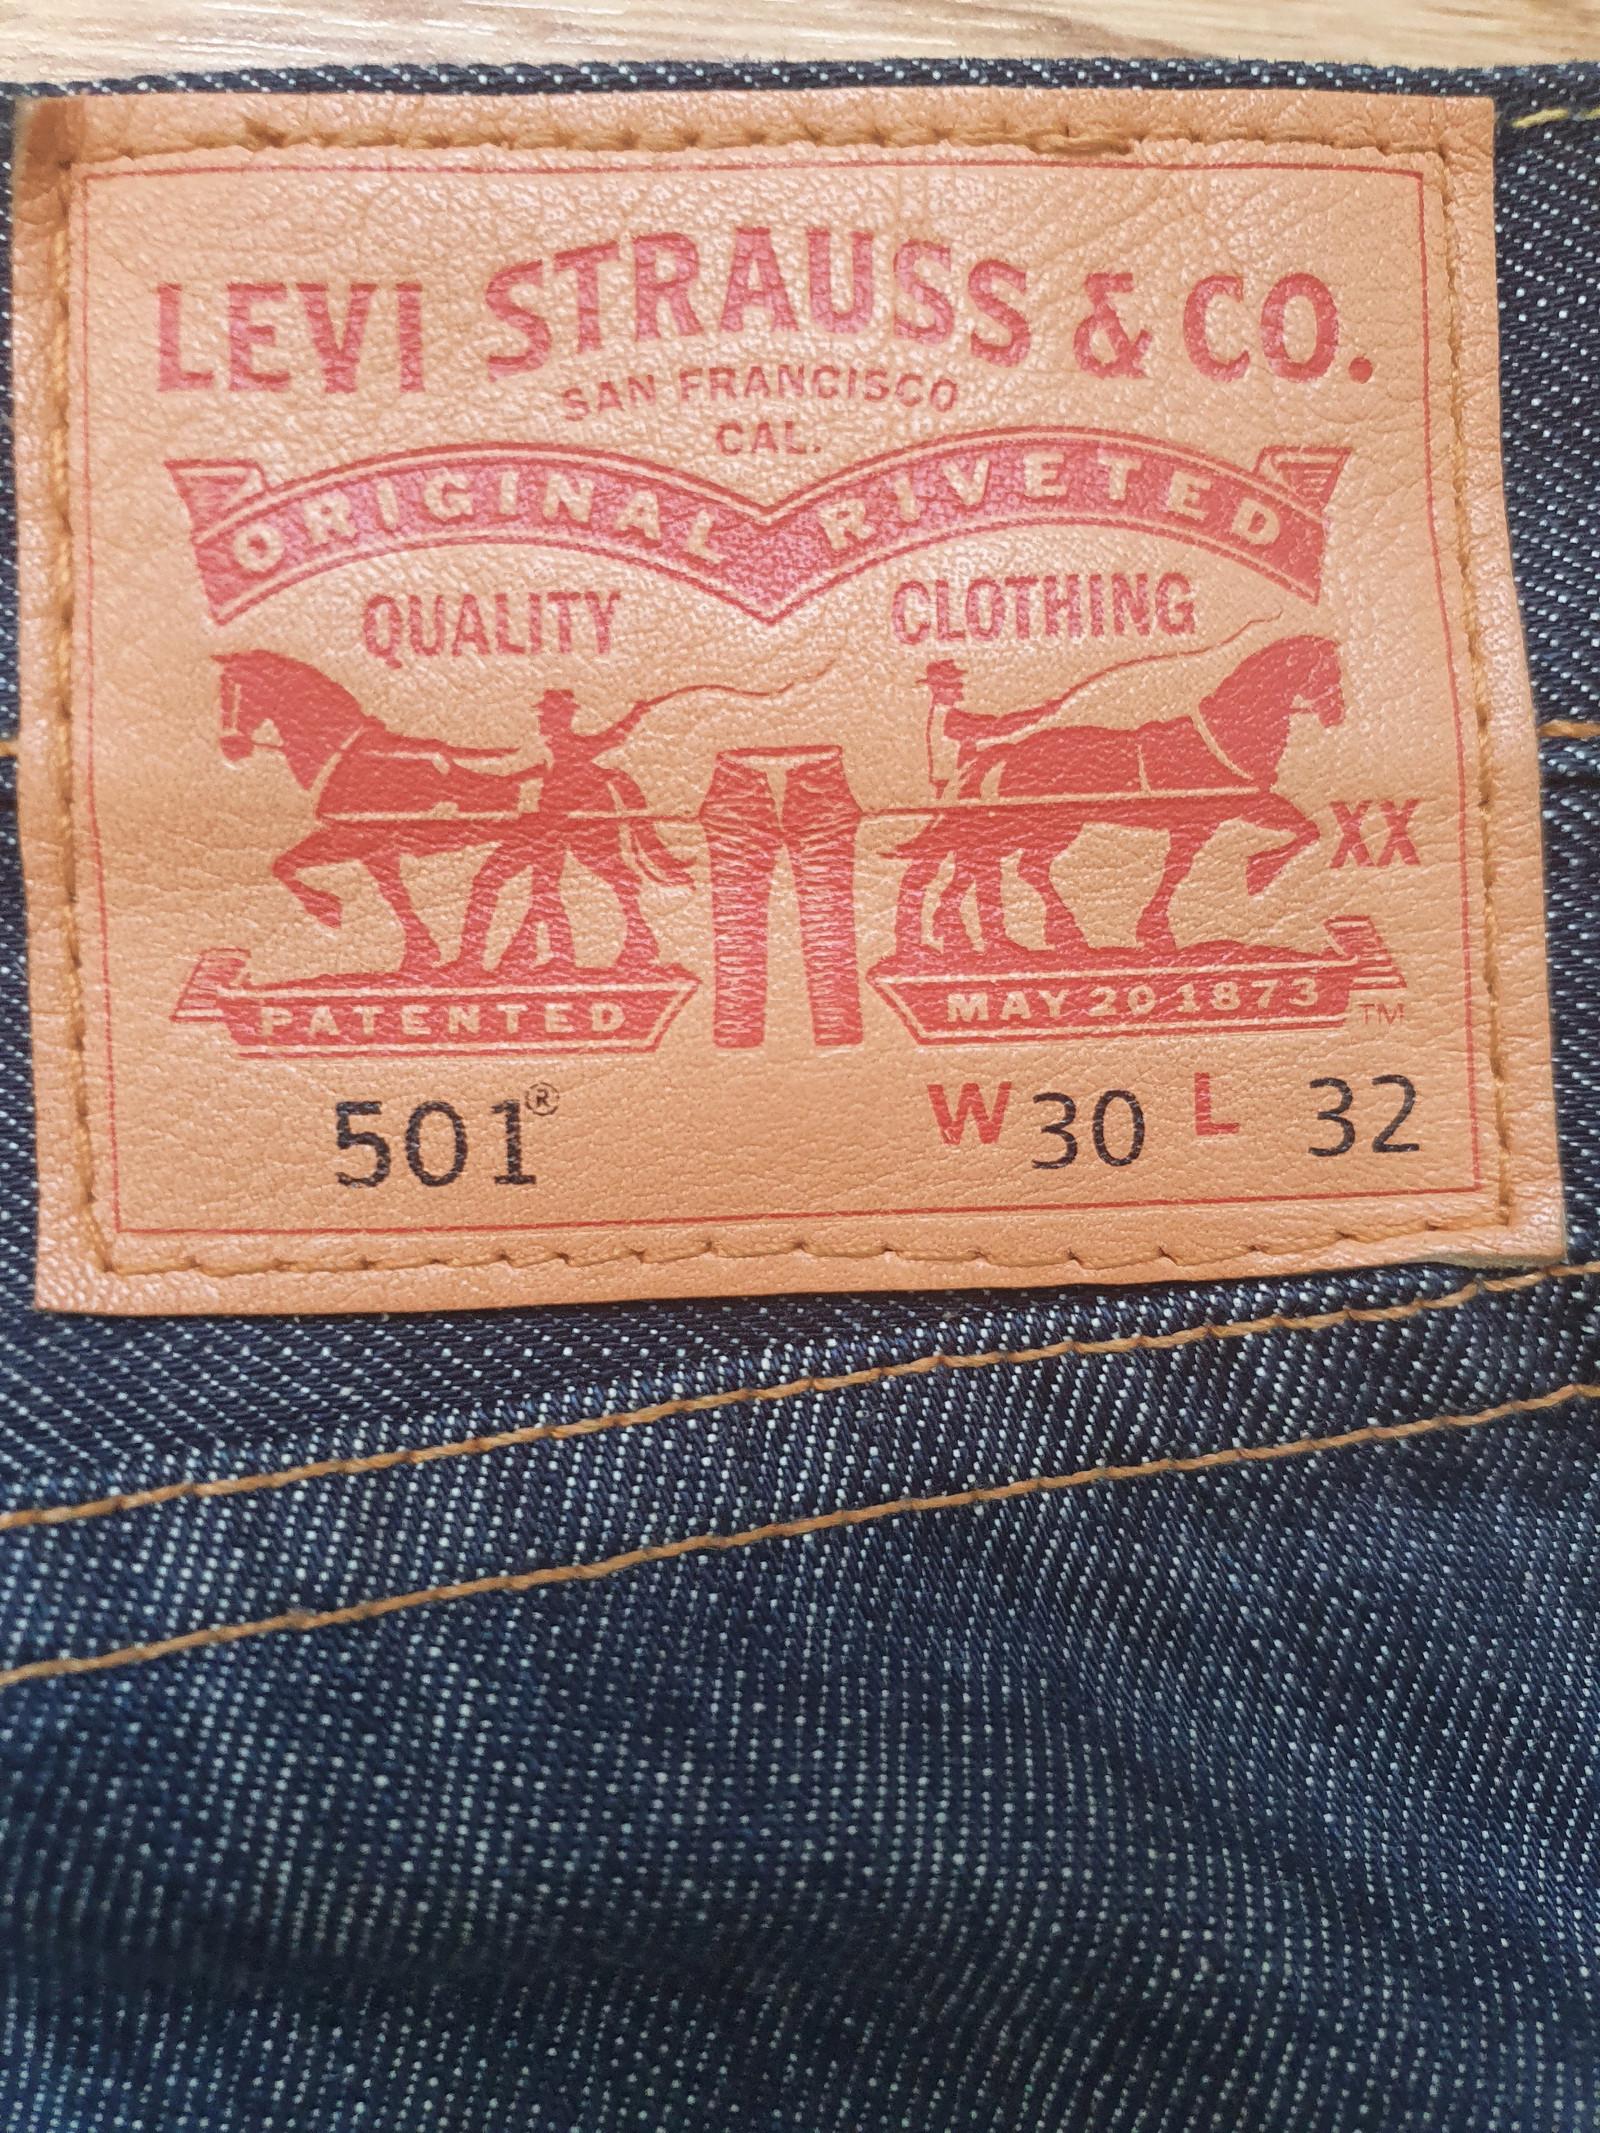 LEVIS 501 bukser str 3032   FINN.no